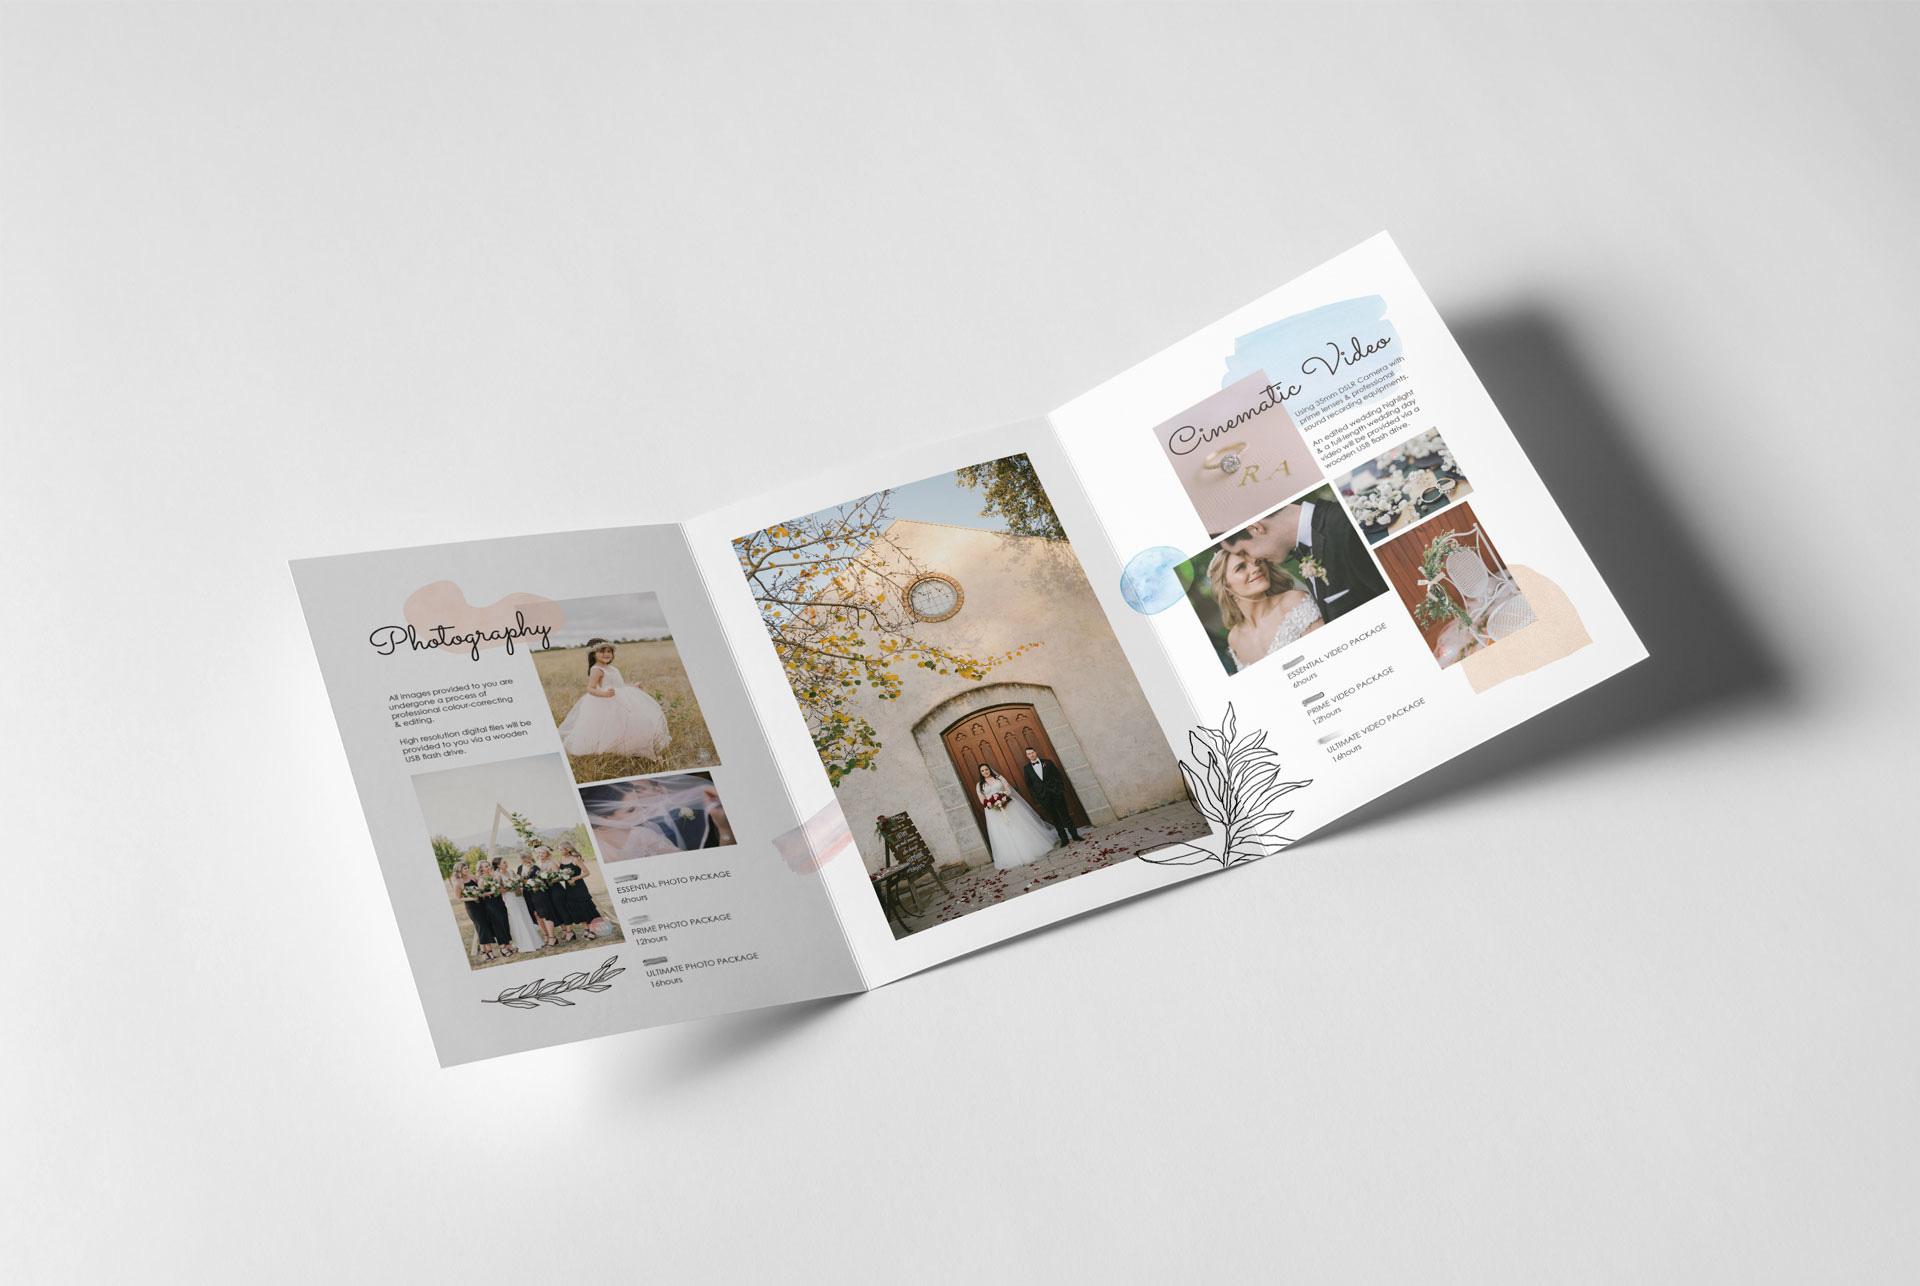 photography studio branding by Z Creative Studio Branding & Graphic Design Melbourne